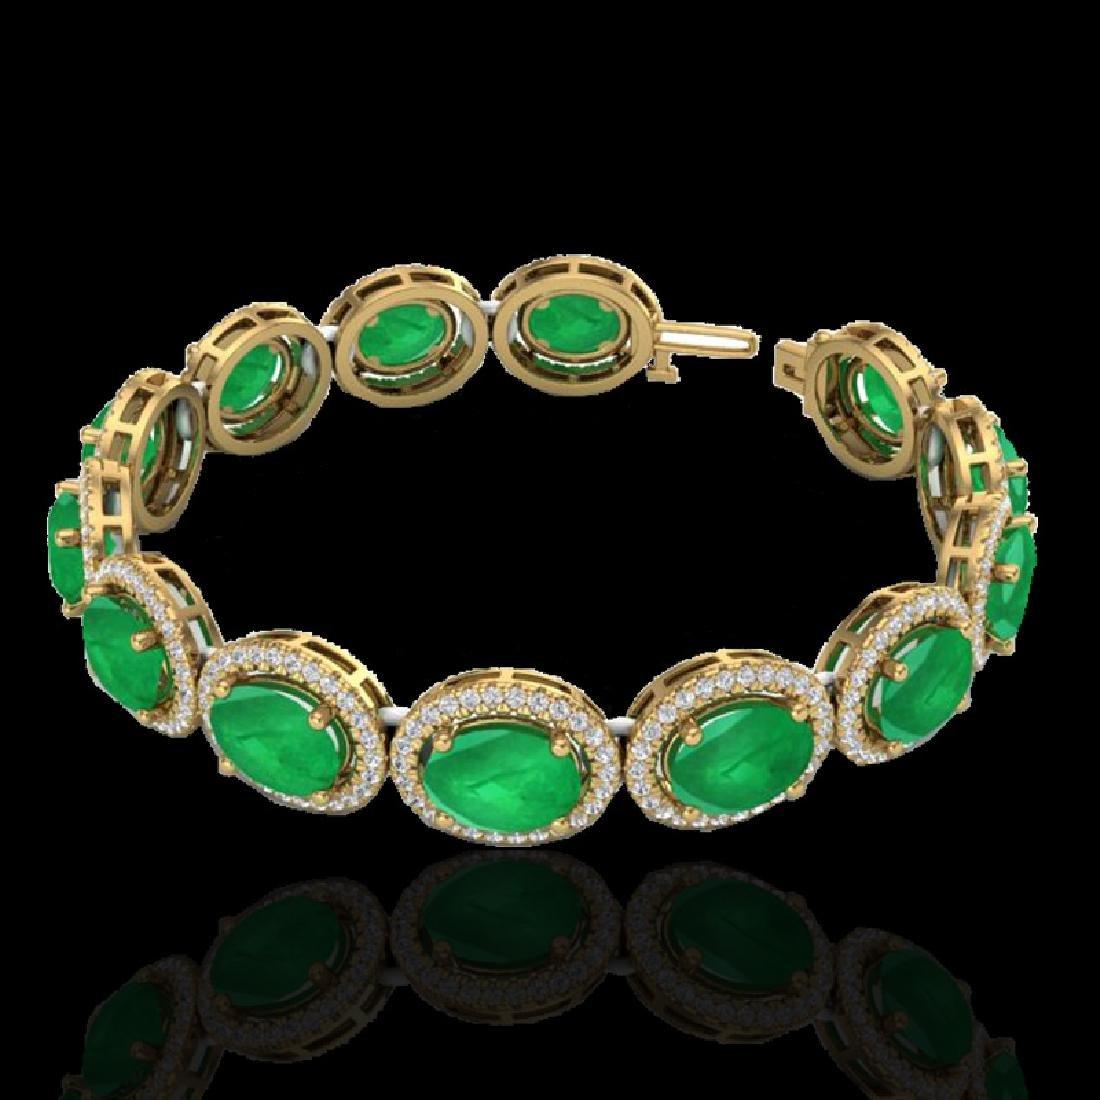 30 CTW Emerald & Micro Pave VS/SI Diamond Bracelet 10K - 2